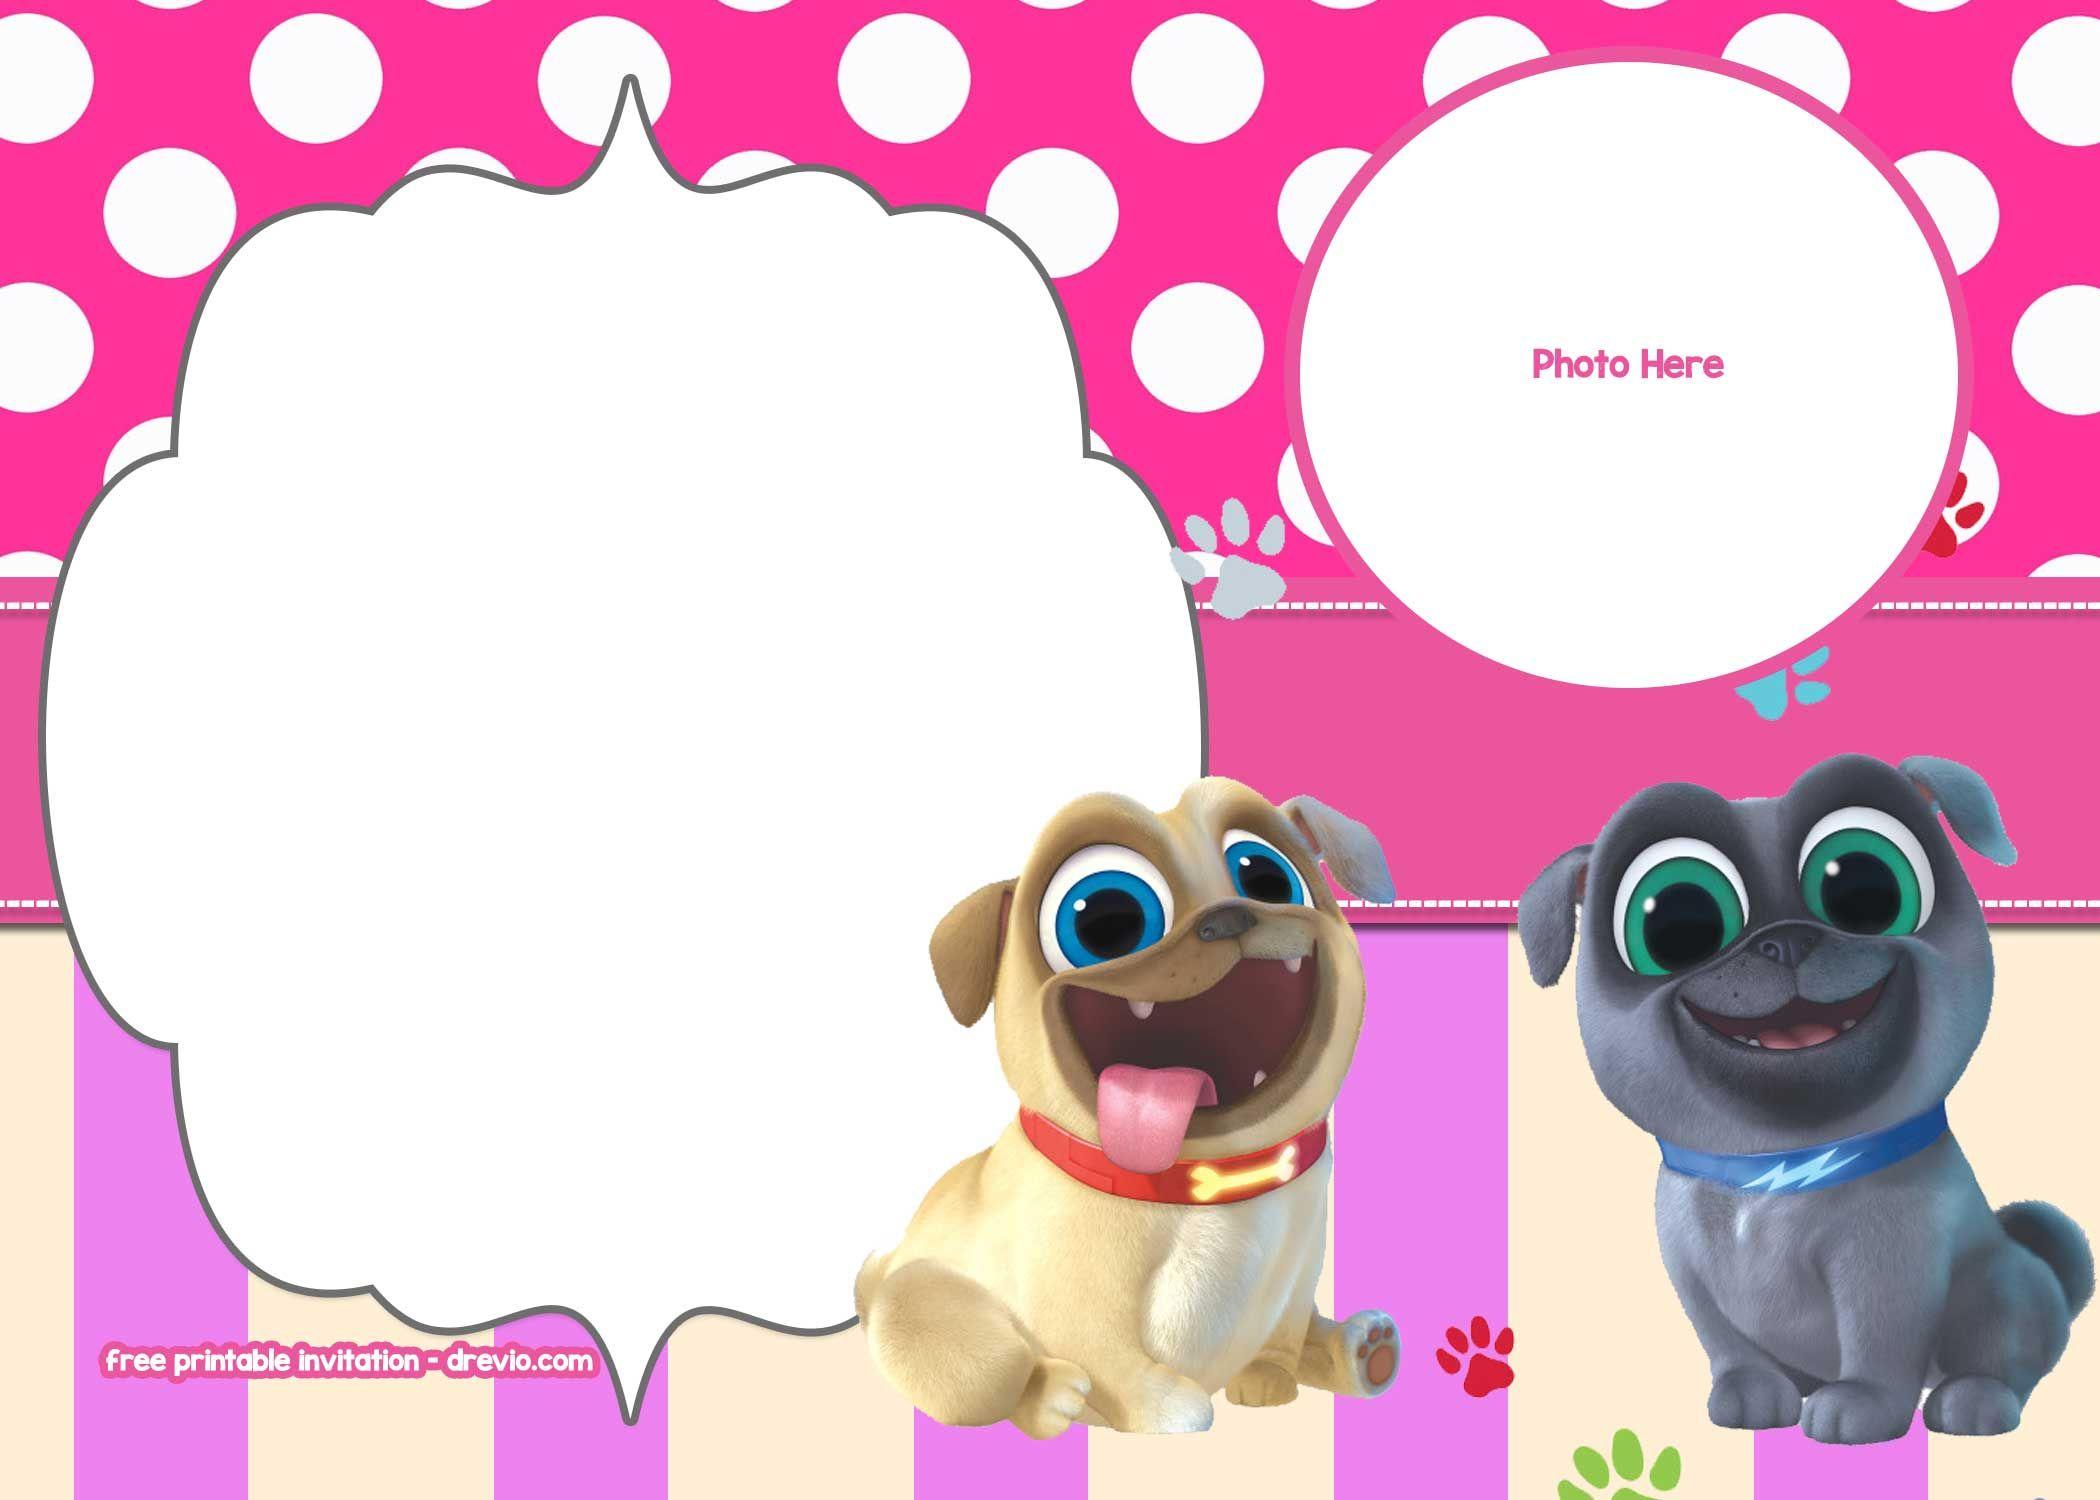 Free Disney Puppy Dog Pals Invitation   Free Printable Birthday - Free Printable Puppy Dog Birthday Invitations